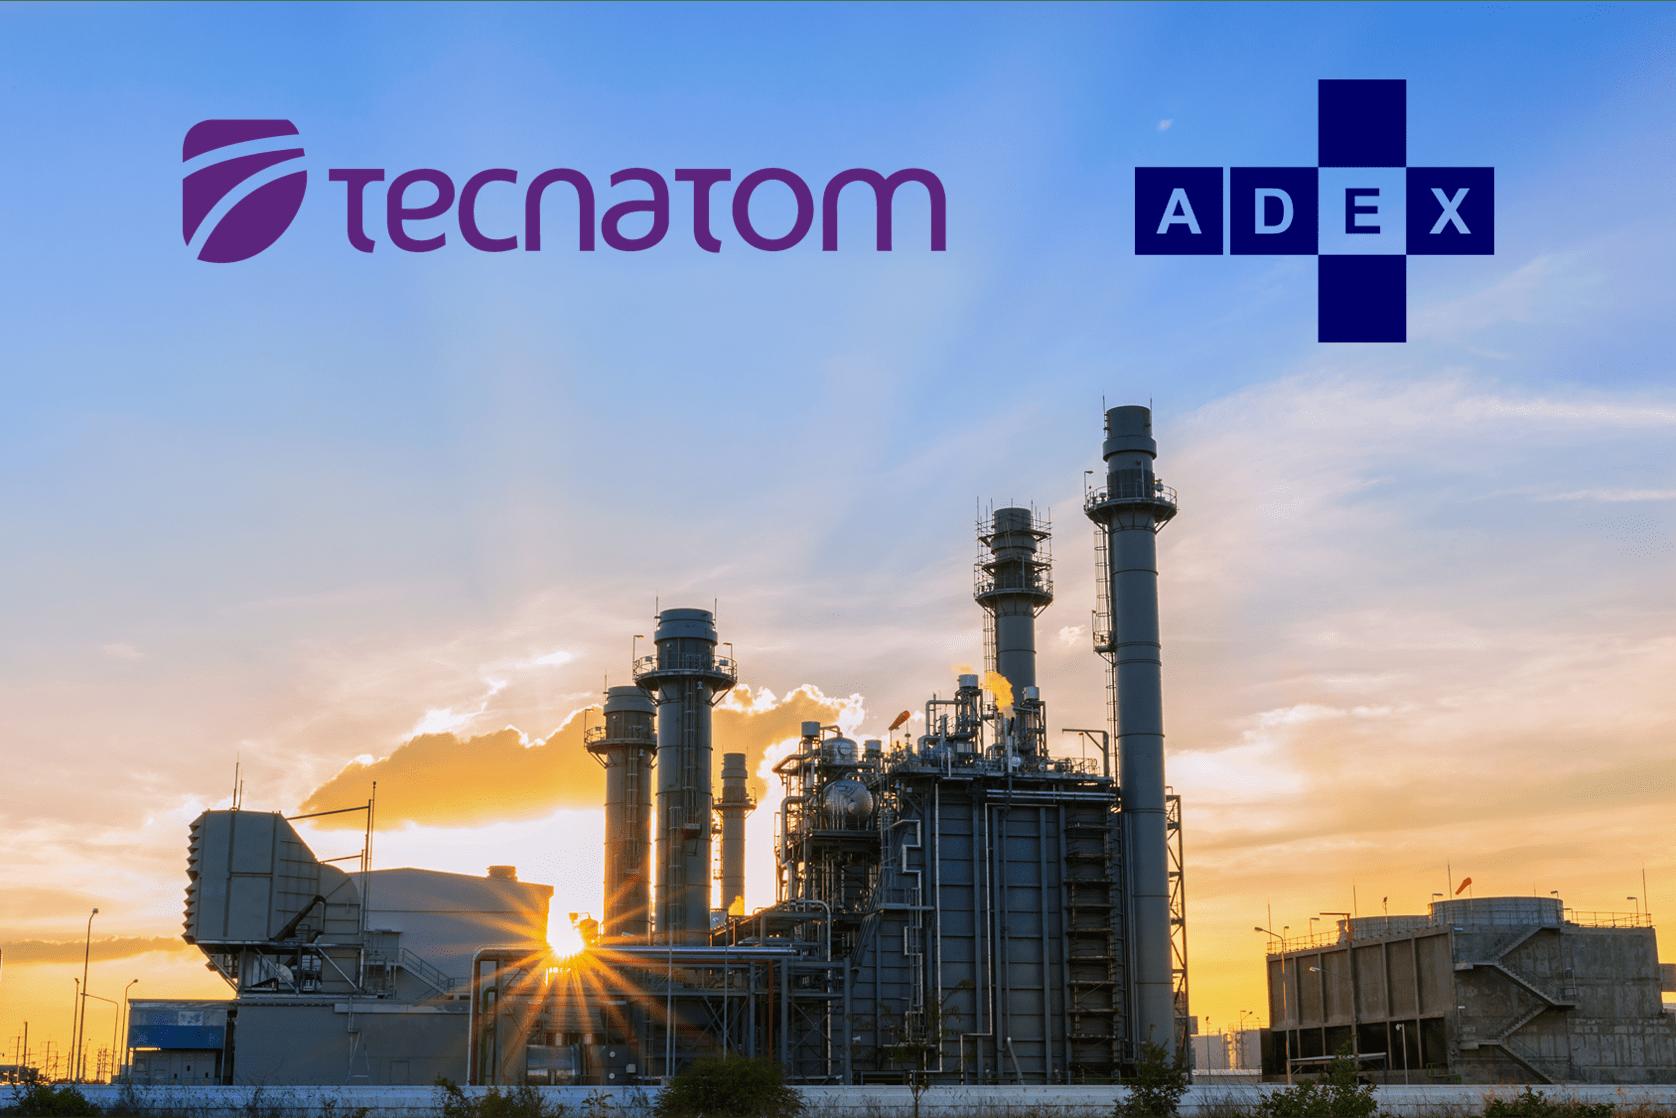 Tecnatom ADEX partnership